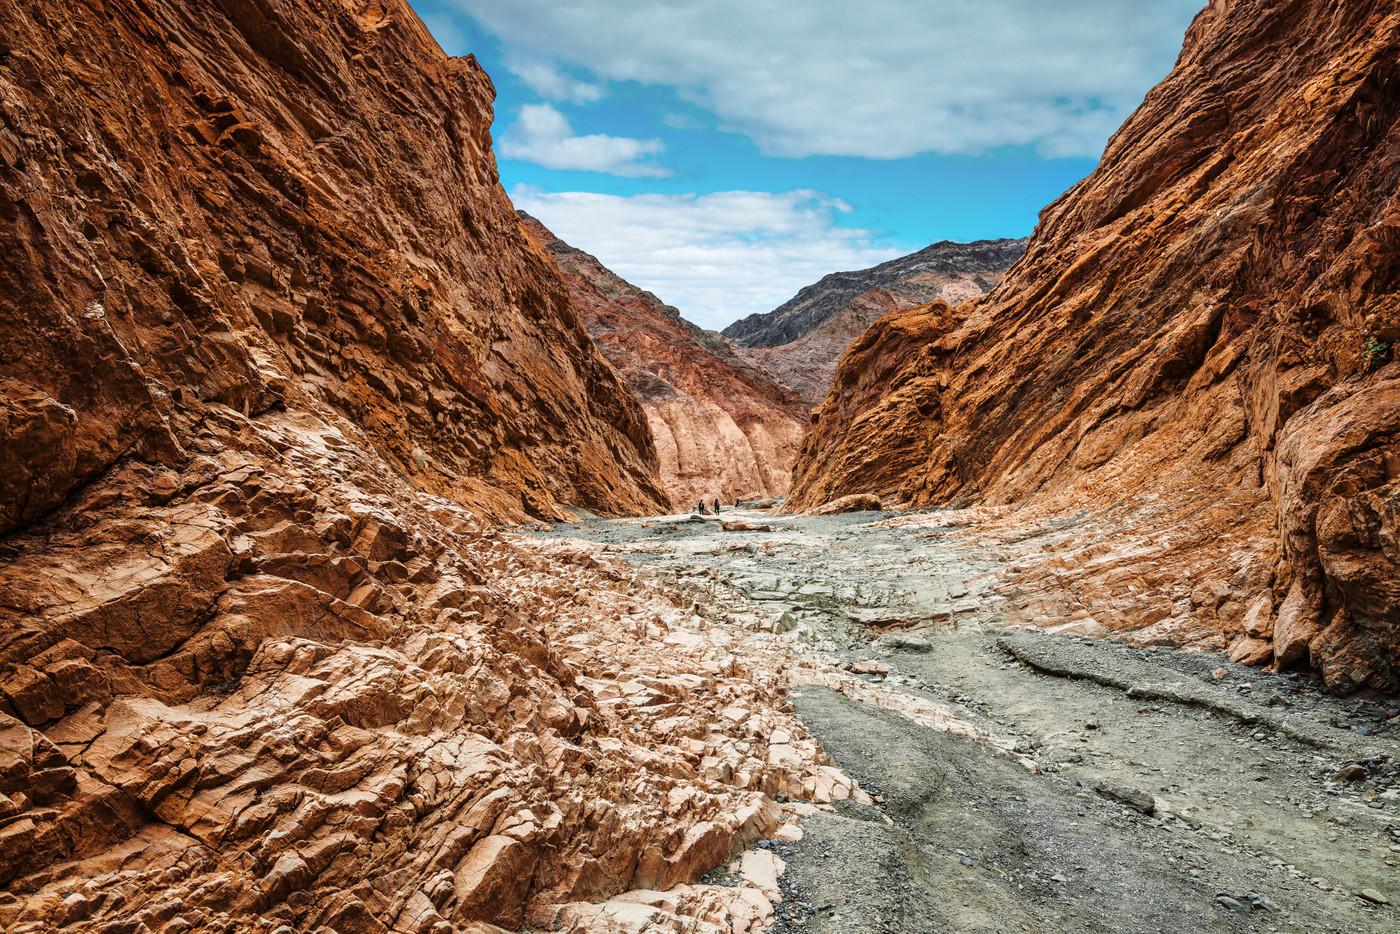 Mosaic Canyon Trail,